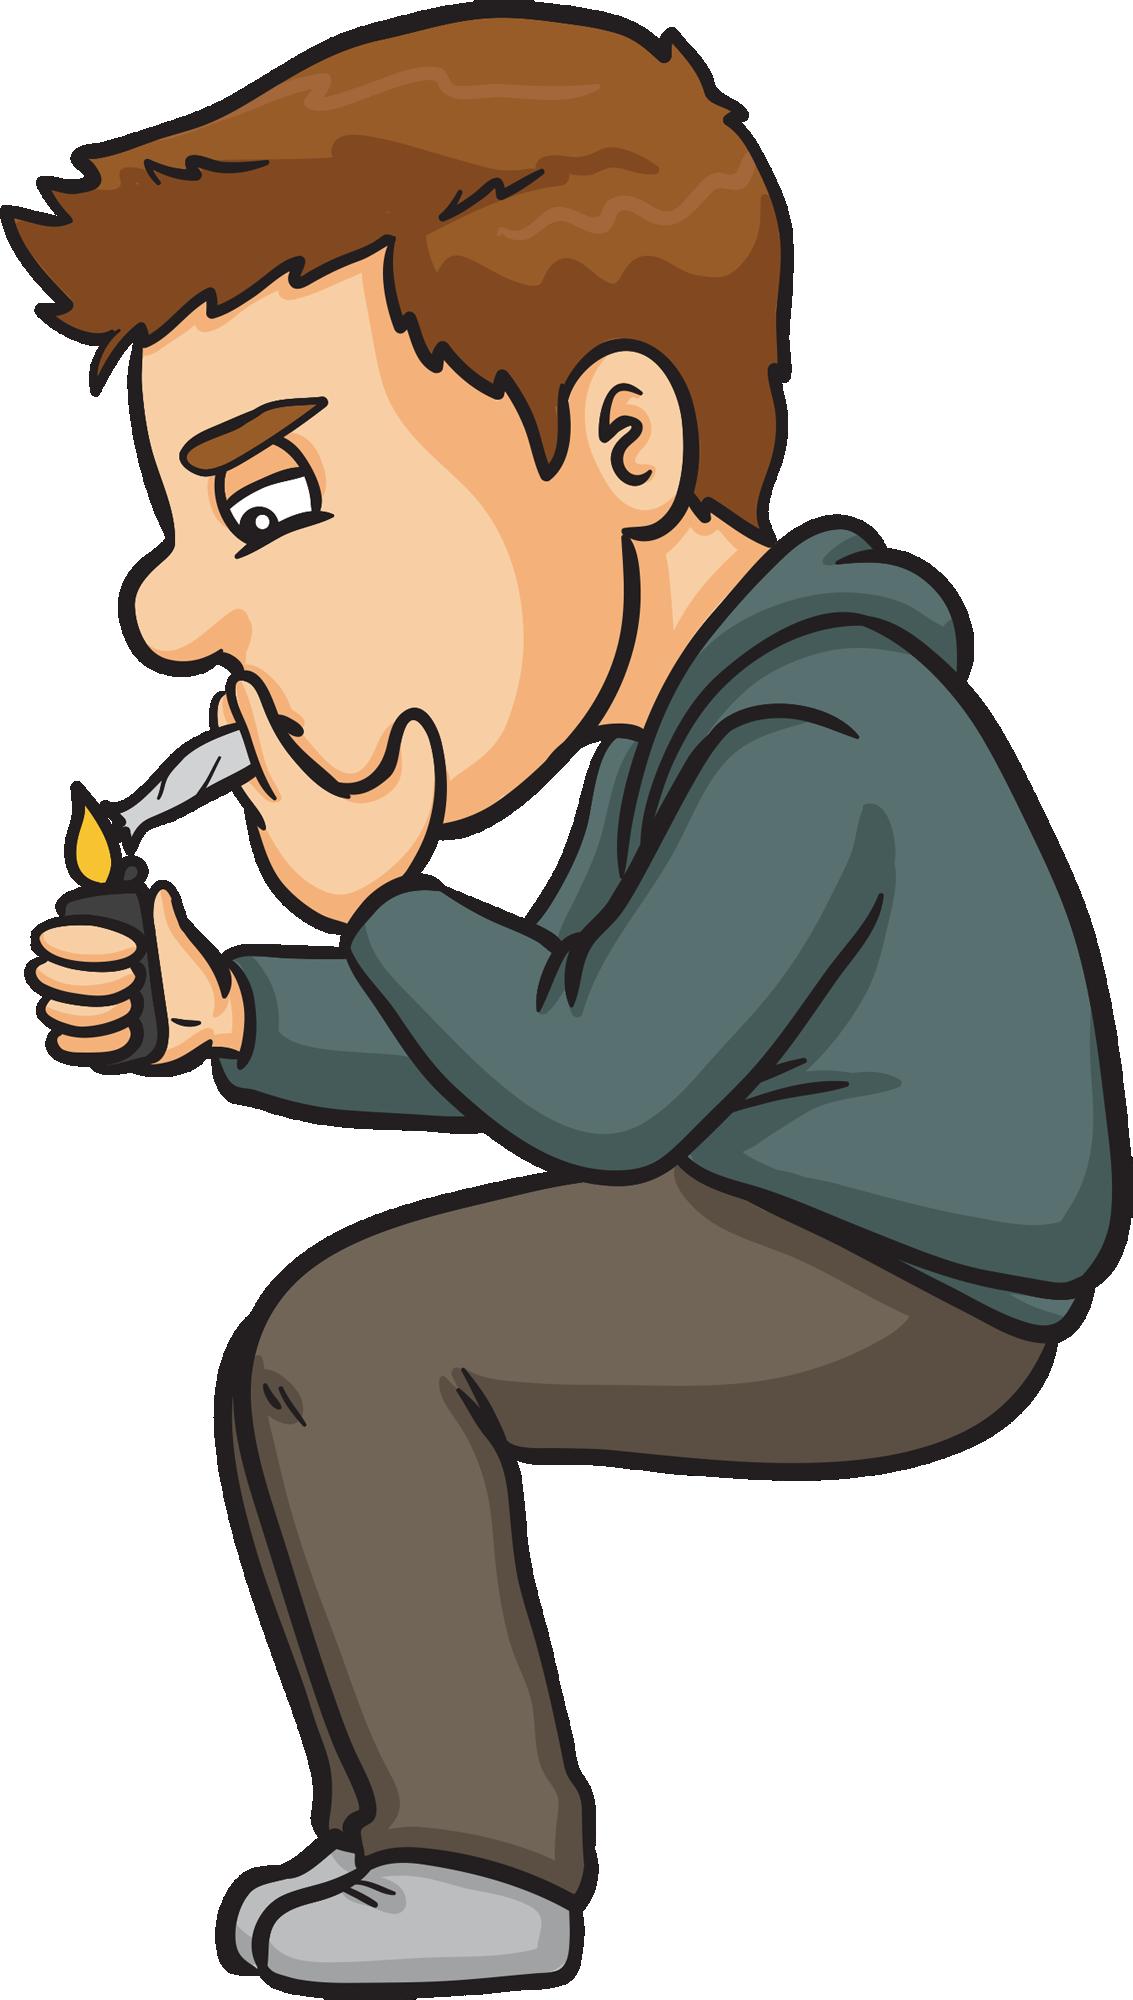 Smoking clipart joint smoke, Smoking joint smoke Transparent.